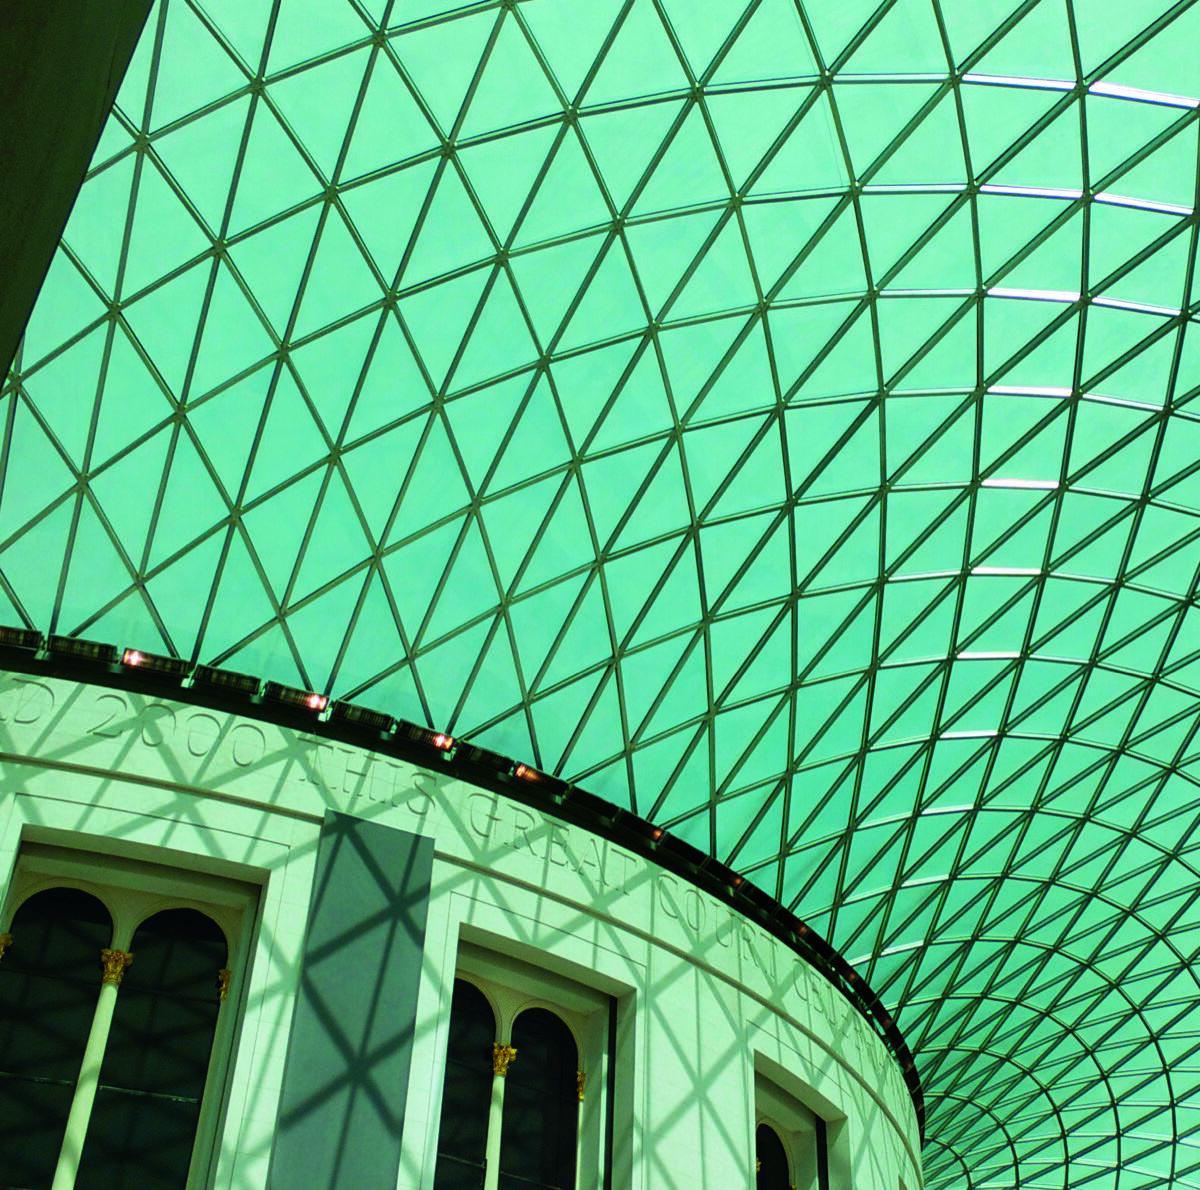 John Pawson, Bloomsbury, London, July 2012. Courtesy of Phaidon.